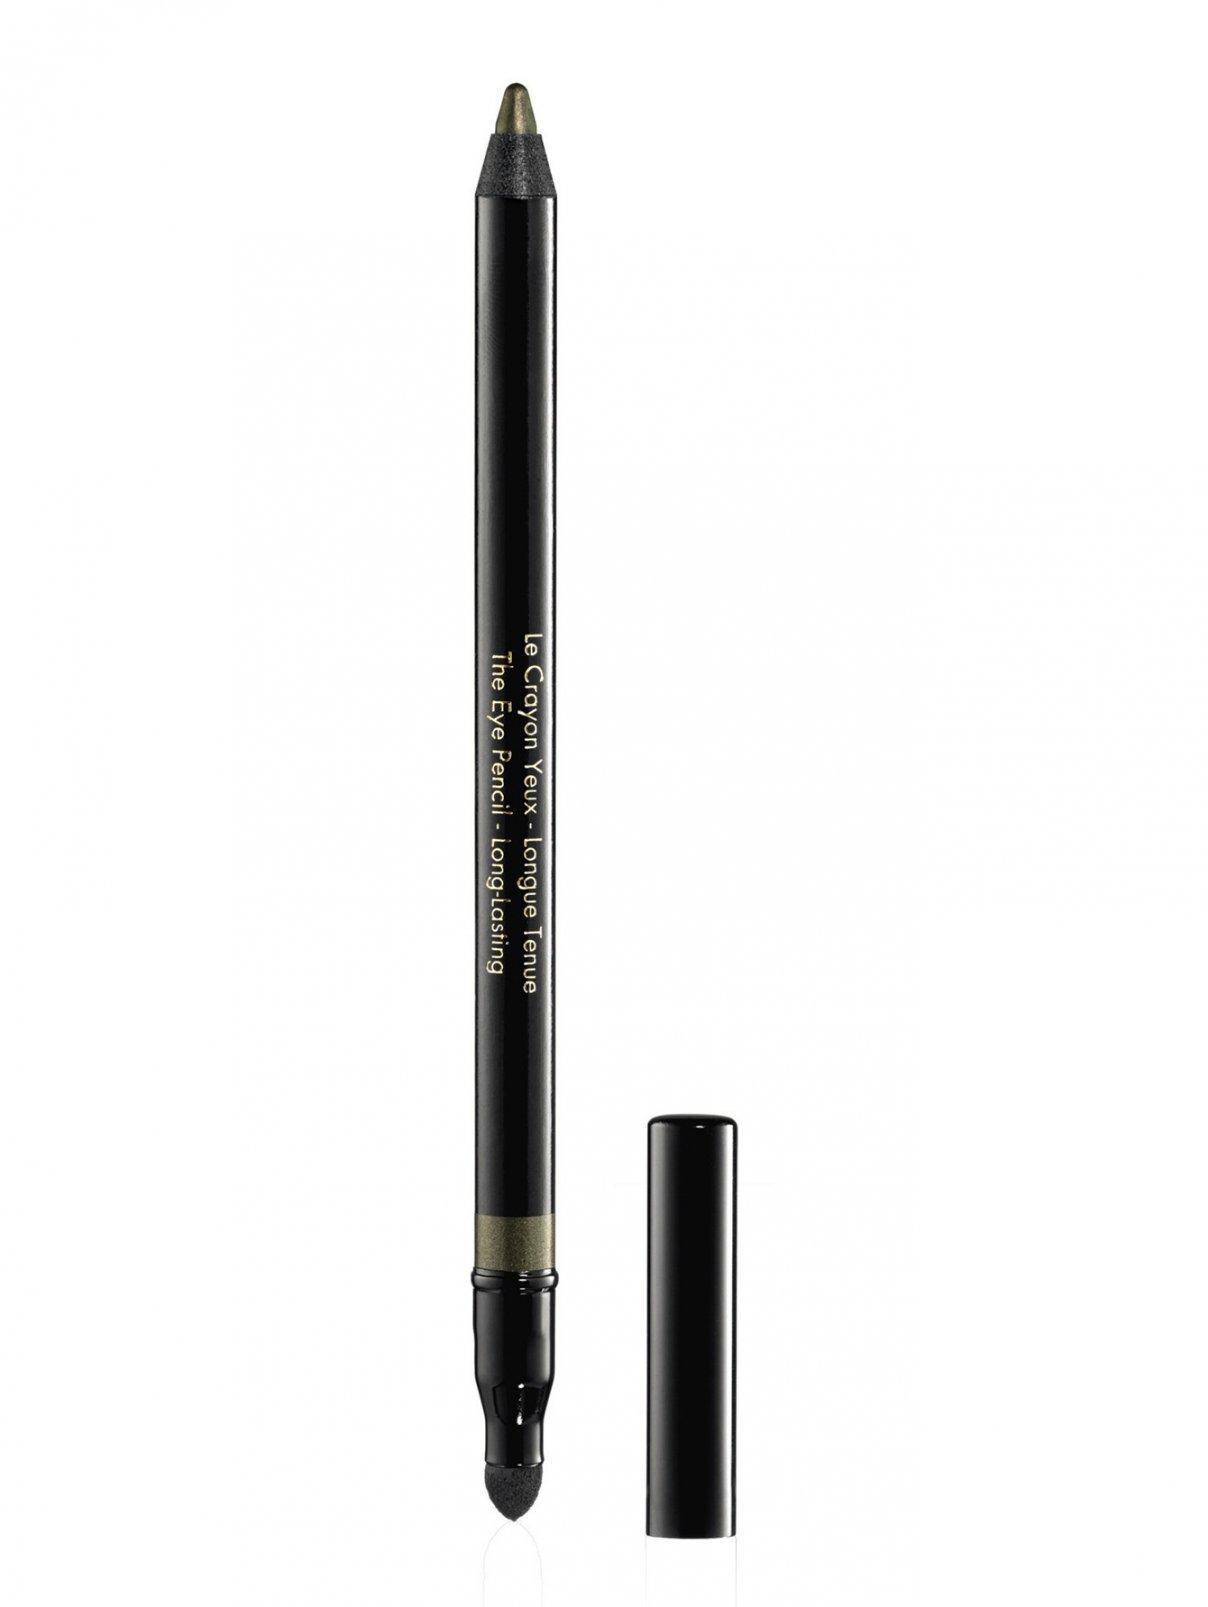 Карандаш для глаз - №05 хаки, Eye pencil Guerlain  –  Общий вид